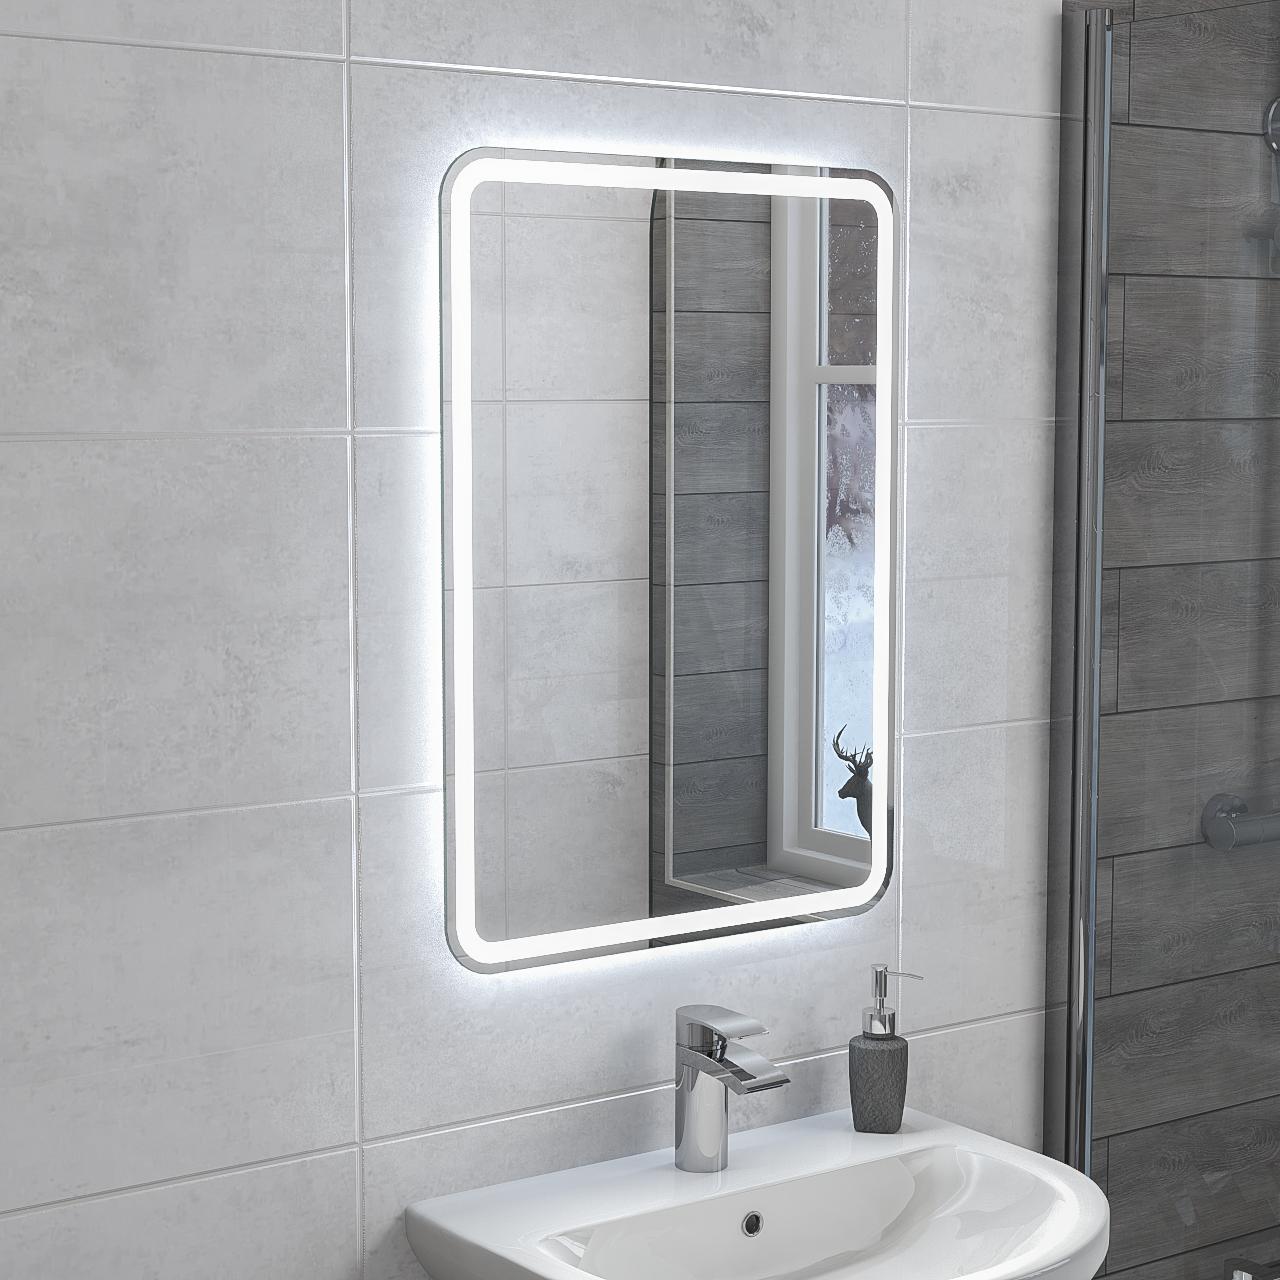 Hora 500mm X 700mm Rectangular Led Mirror In 2020 Led Mirror Mirror Led